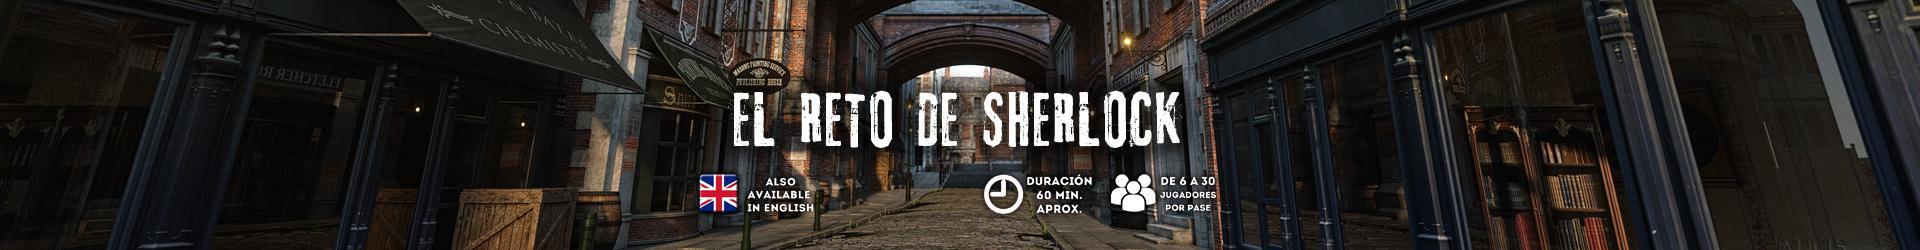 HEADER-SHERLOCK